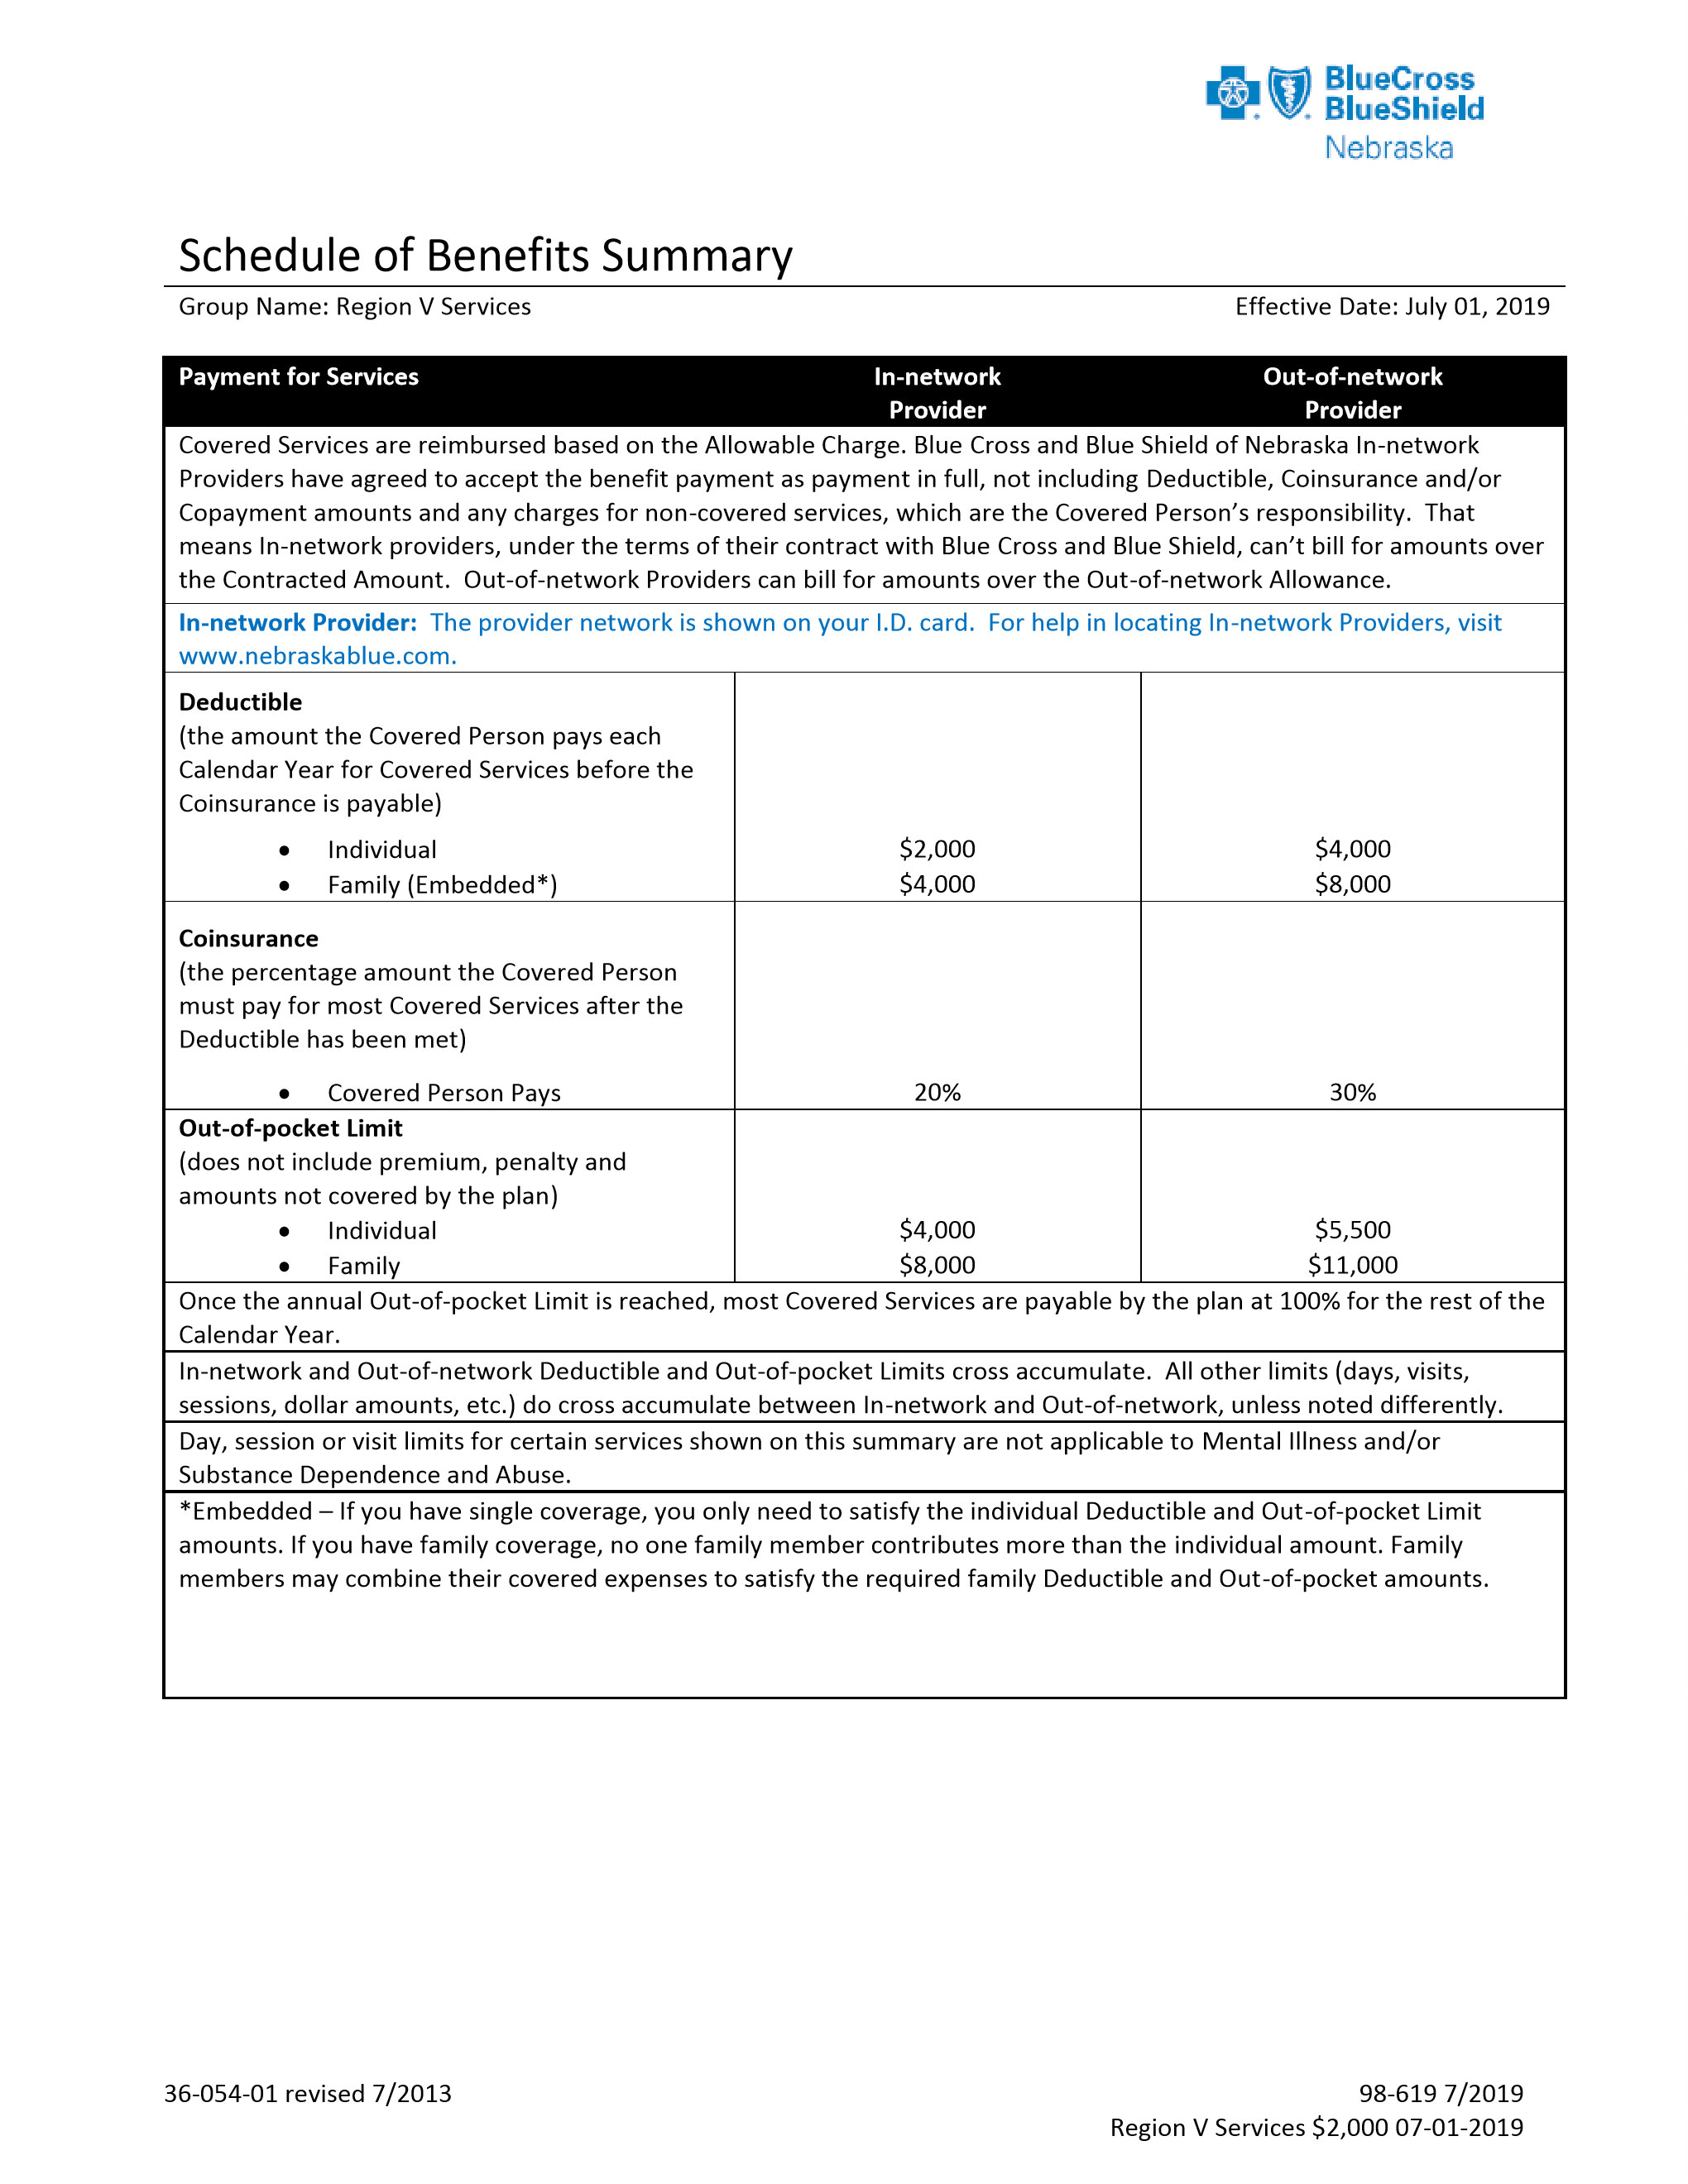 Region V Services : Resources : Employee Resources